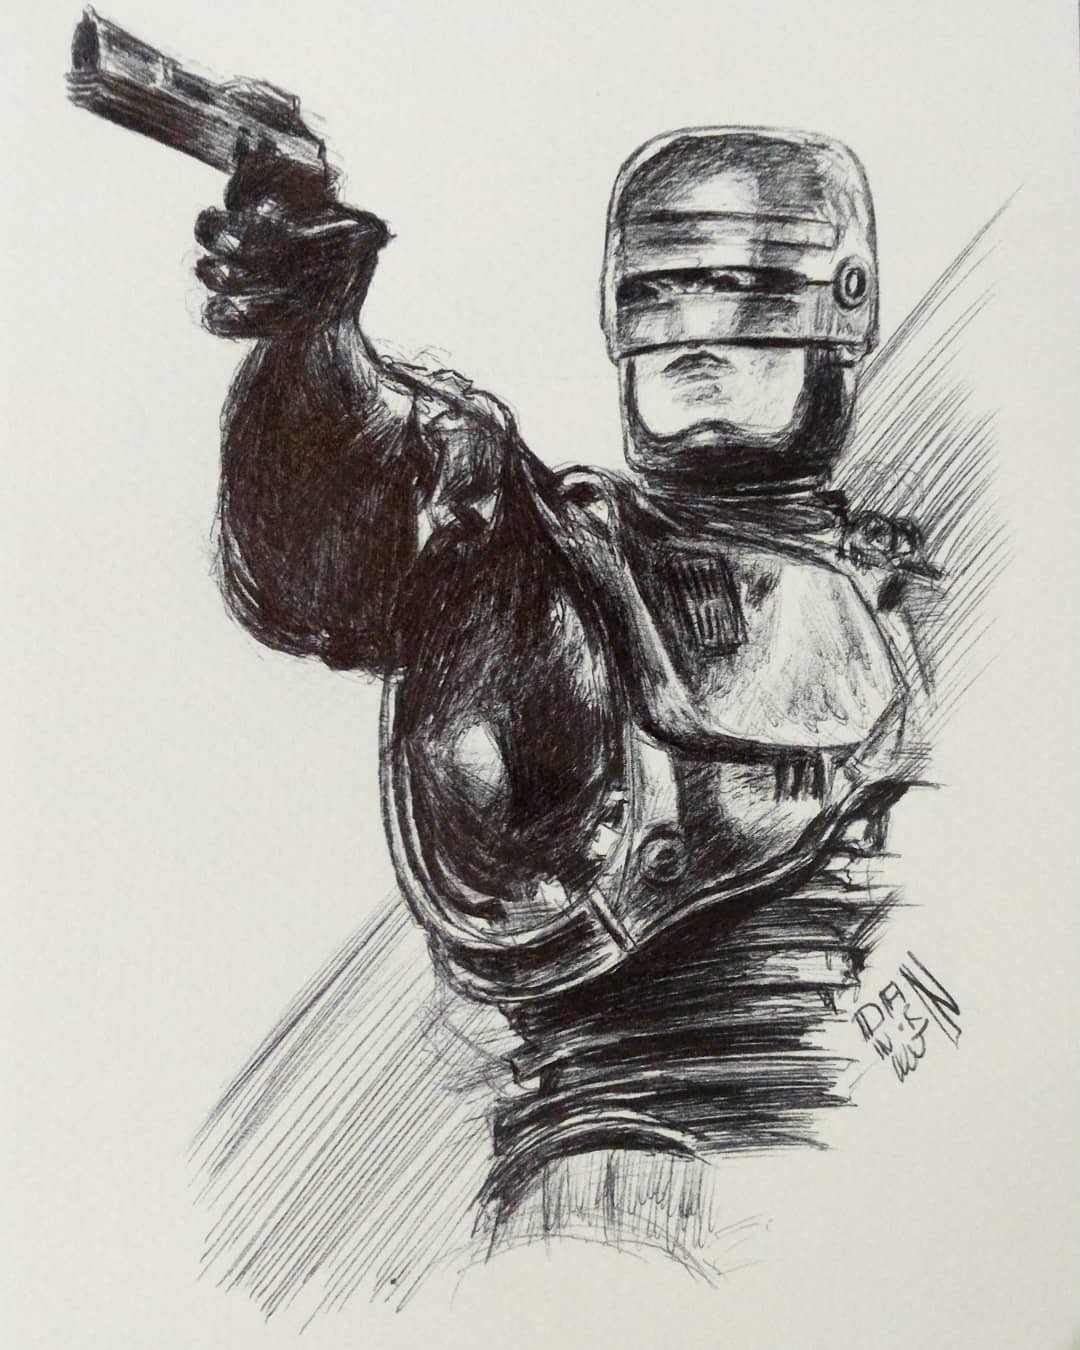 March Of Robots 10 - Robocop (1987). Bic Pen.